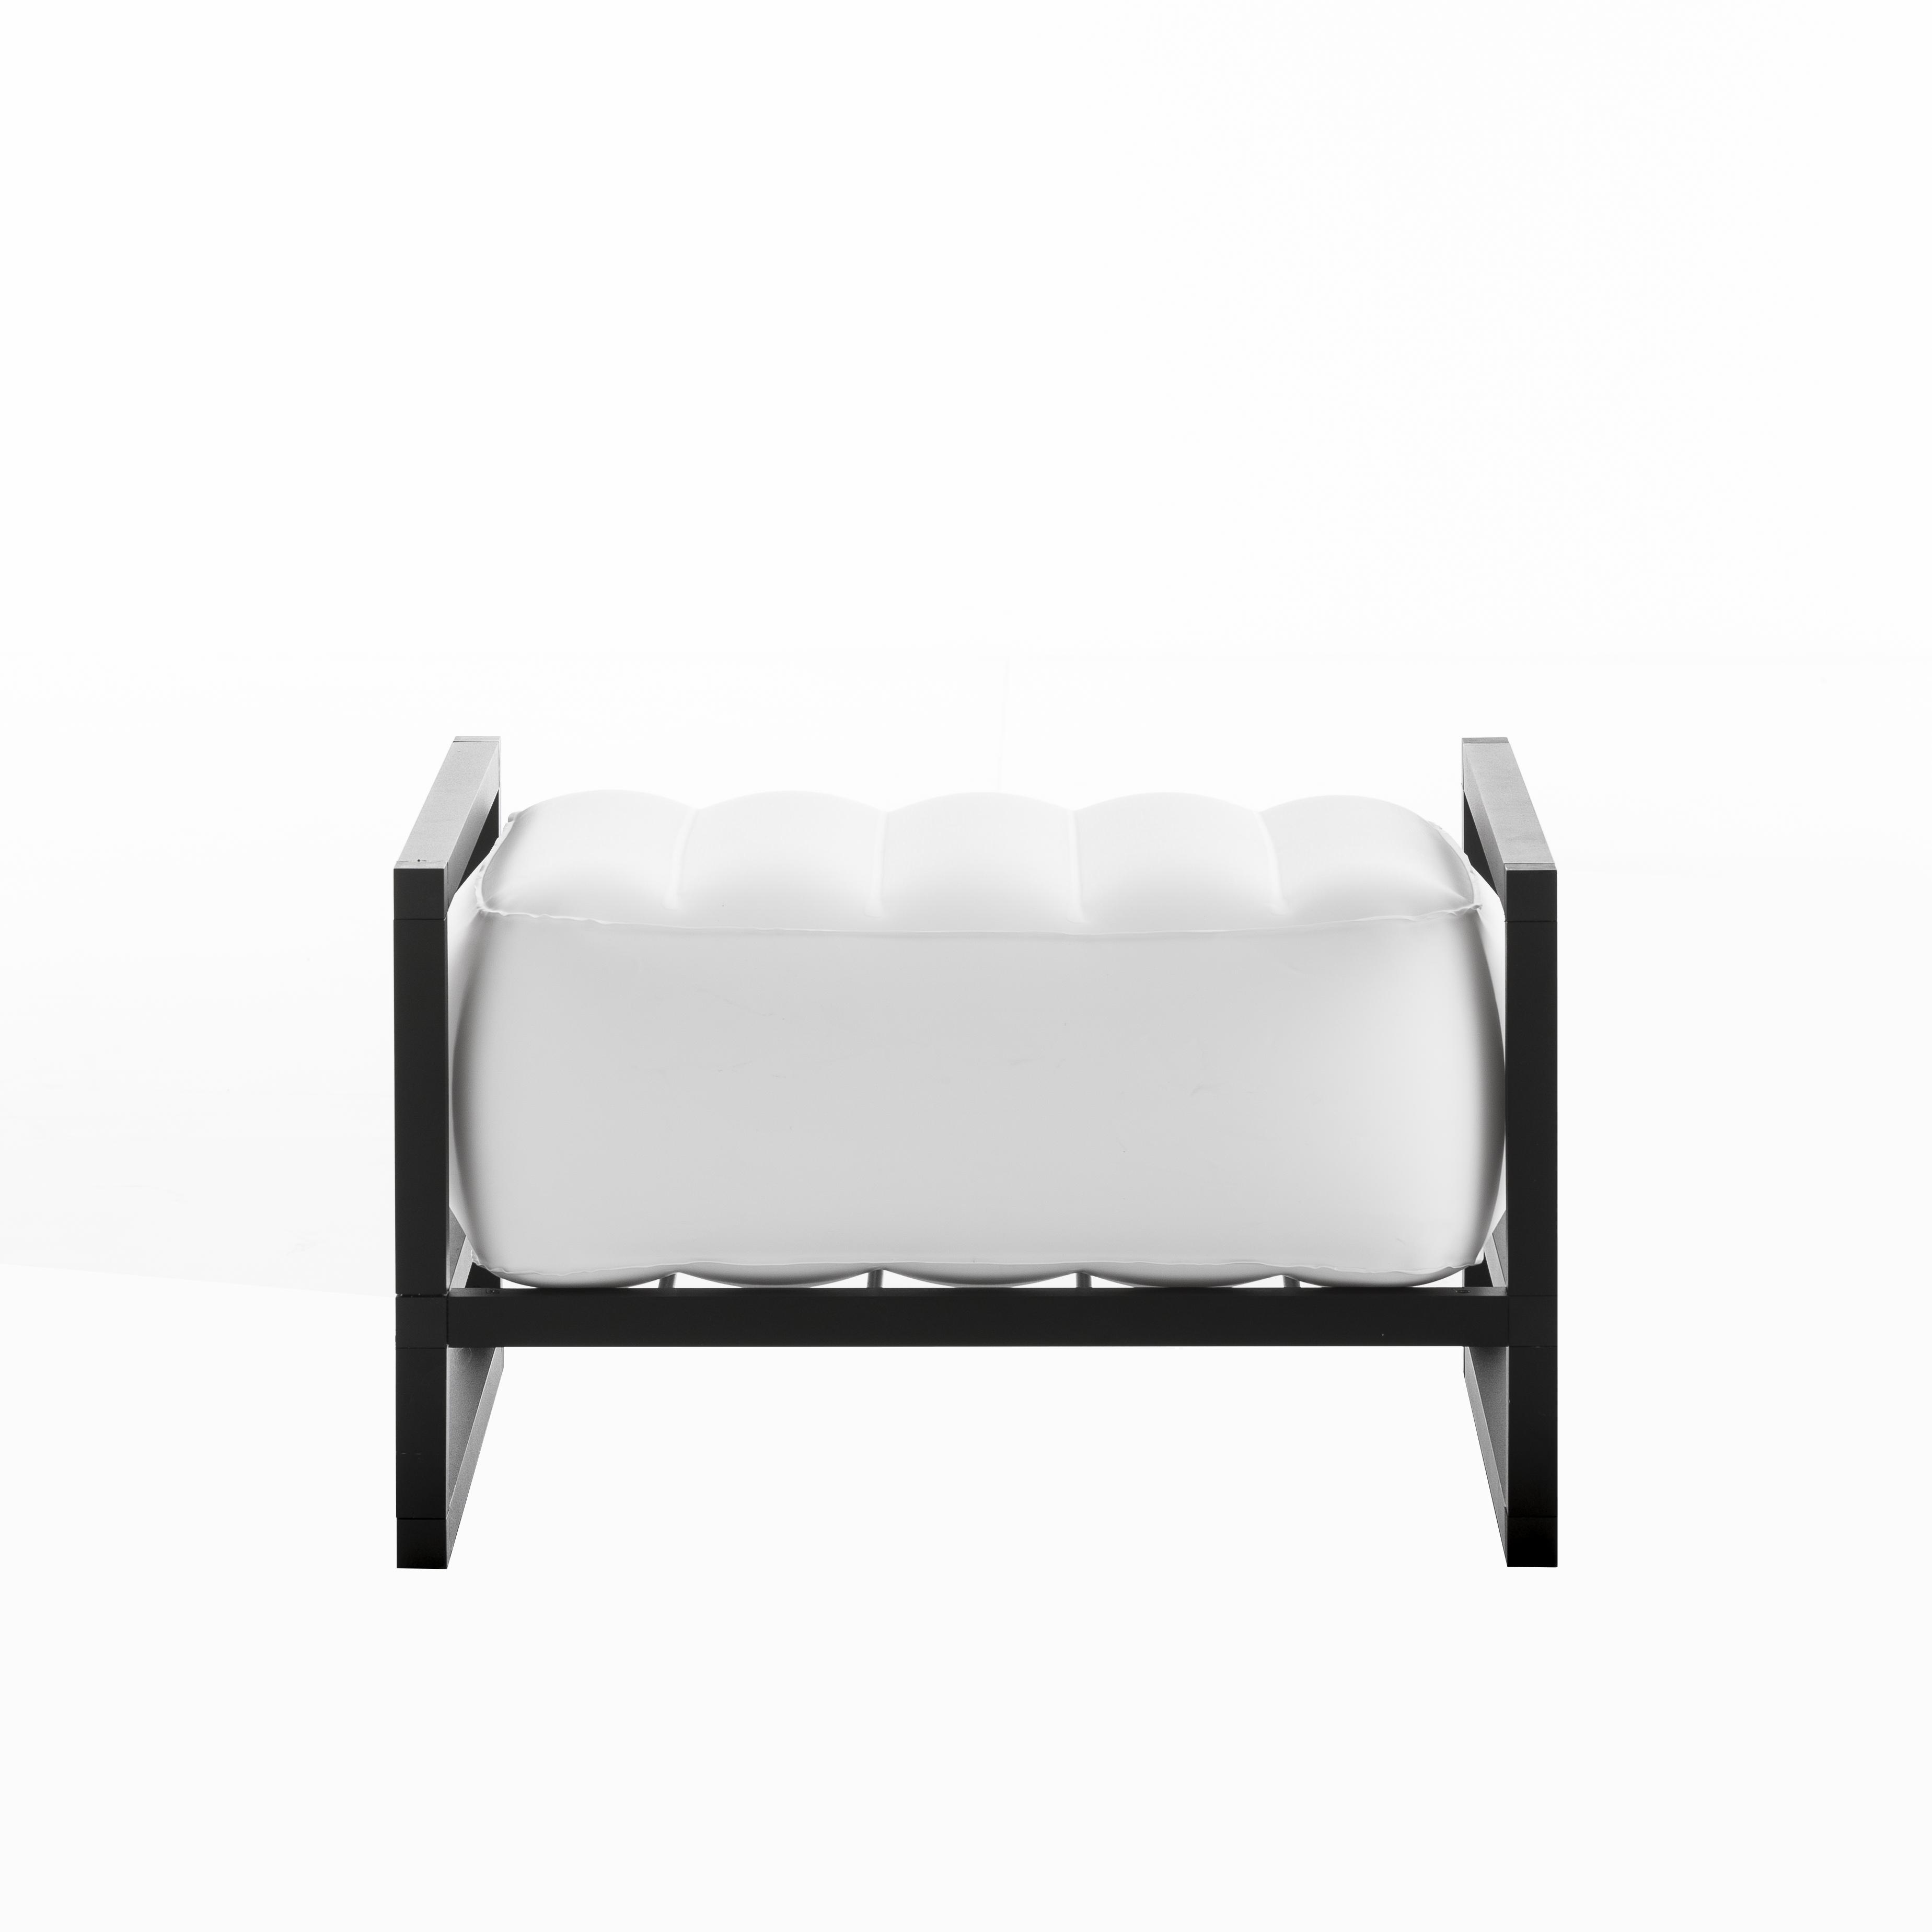 Pouf pvc blanc cadre aluminium